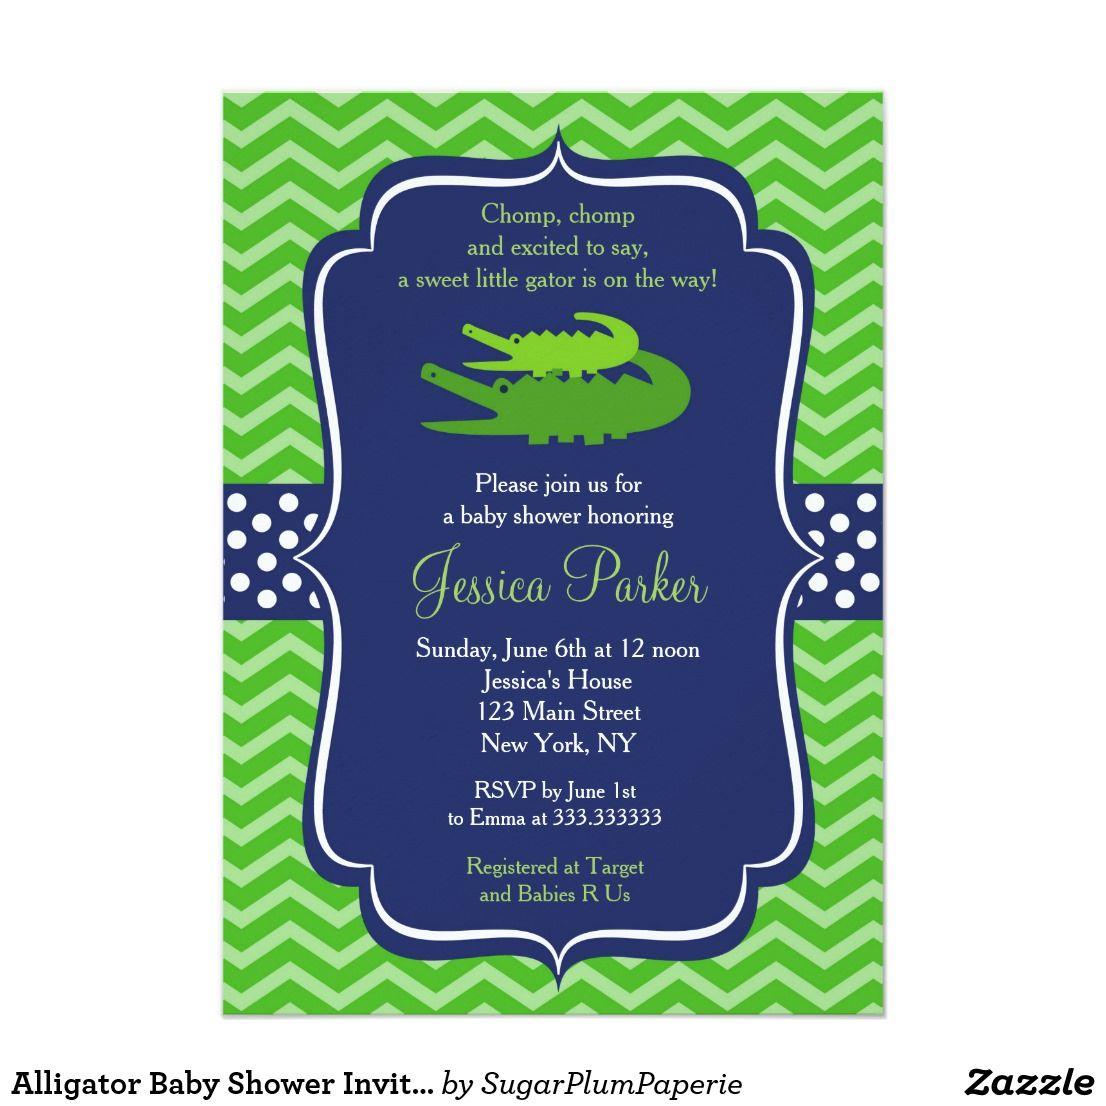 Alligator Baby Shower Invitations | Alligator baby showers and ...